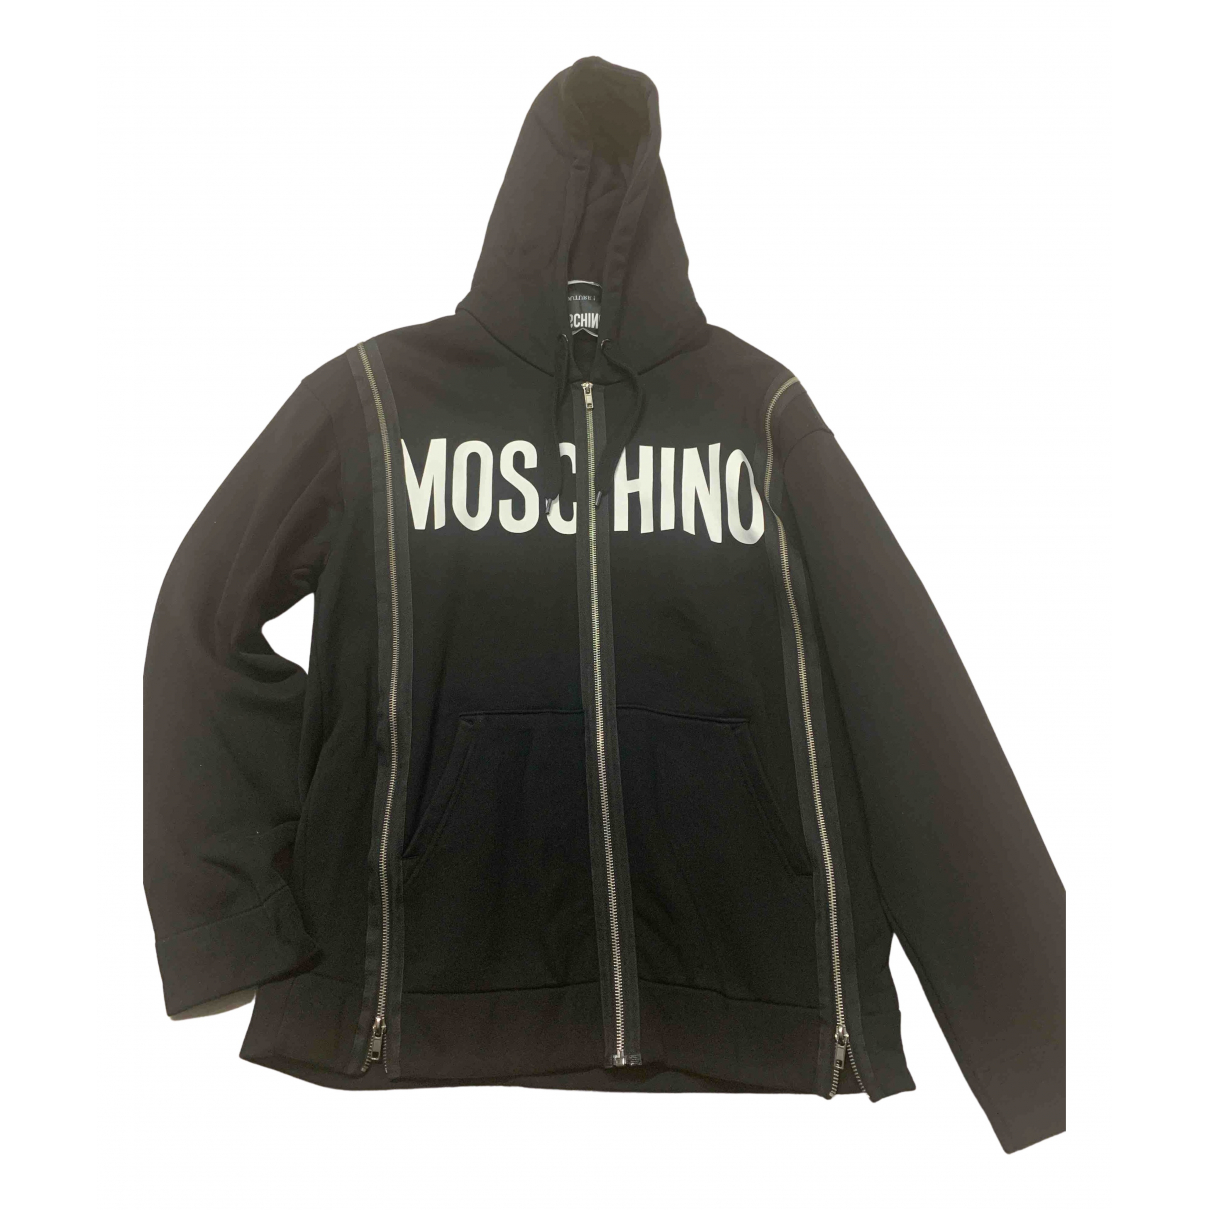 Moschino N Black Cotton Knitwear & Sweatshirts for Men 34 UK - US